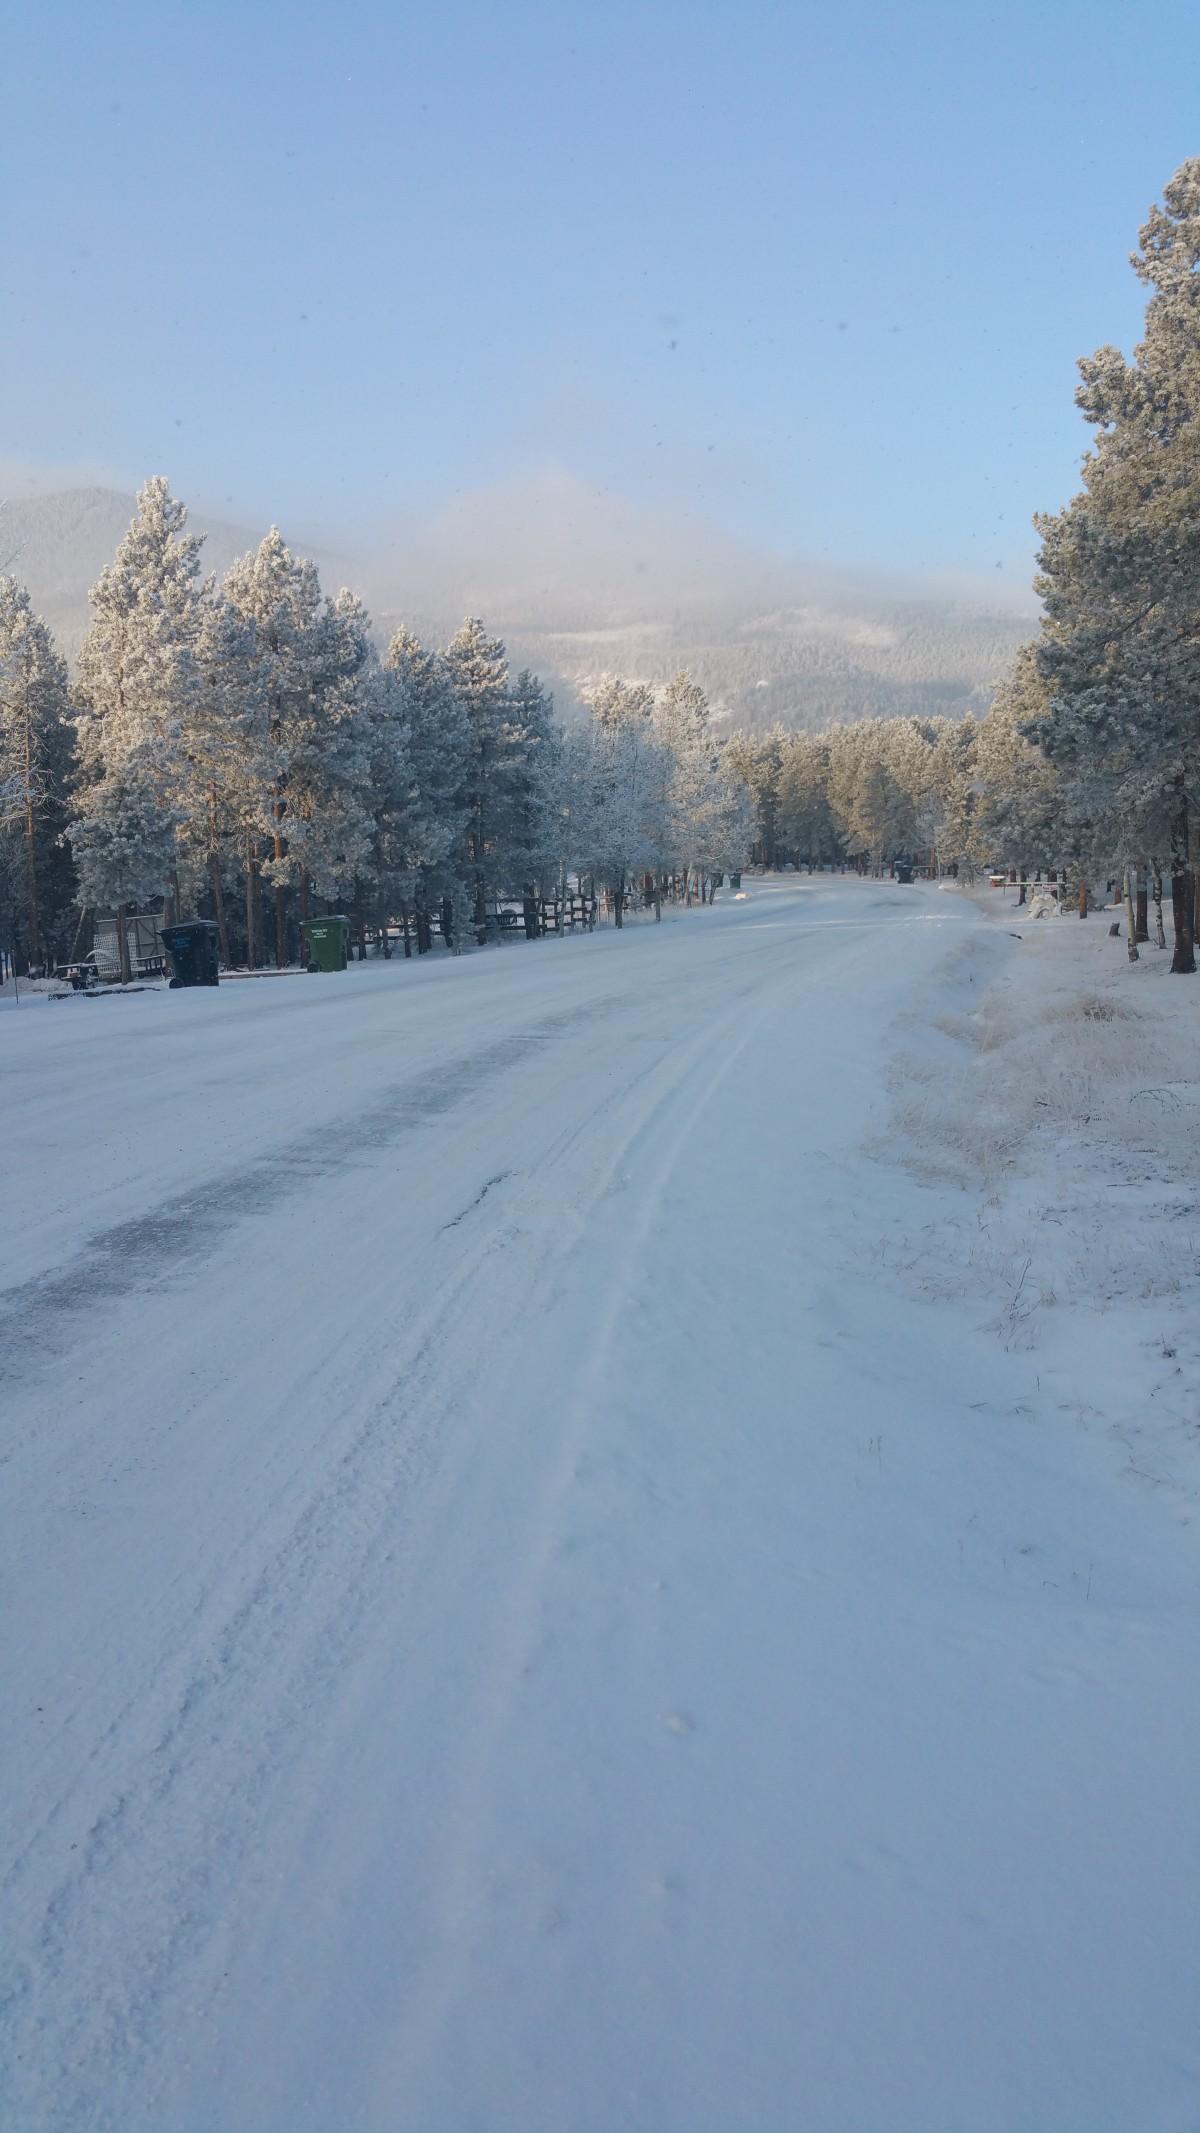 Black Mtn. Drive, toward Evergreen